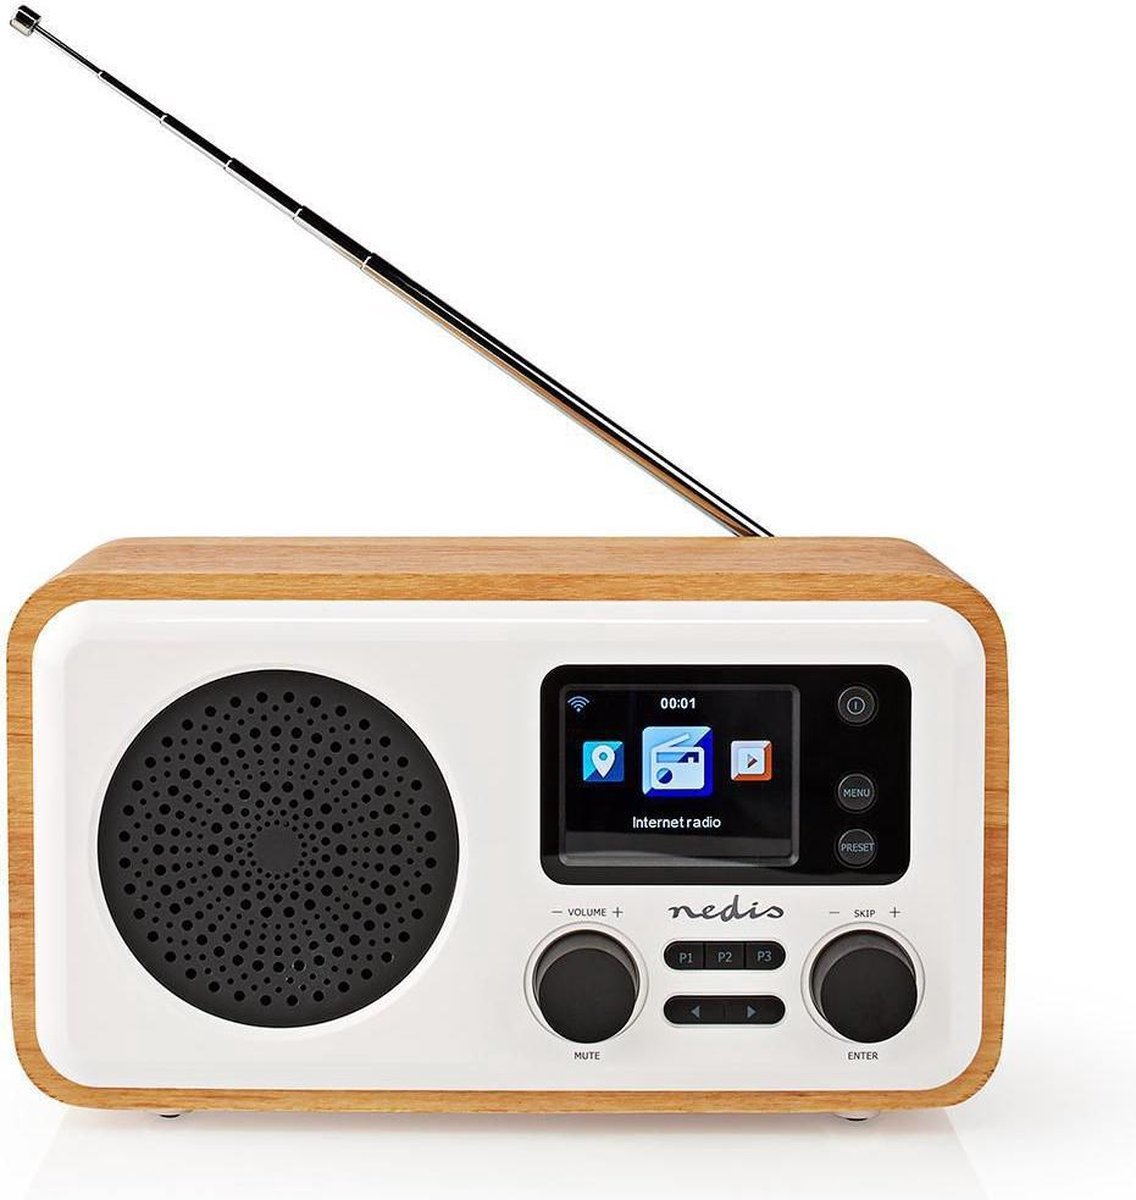 "Internetradio   Tafelmodel   Bluetooth® / Wi-Fi   DAB+ / FM / Internet   2.4 ""   Kleurenscherm   7 W   Afstandbestuurbaar   App-gestuurd   Wekker   Wit/Hout"